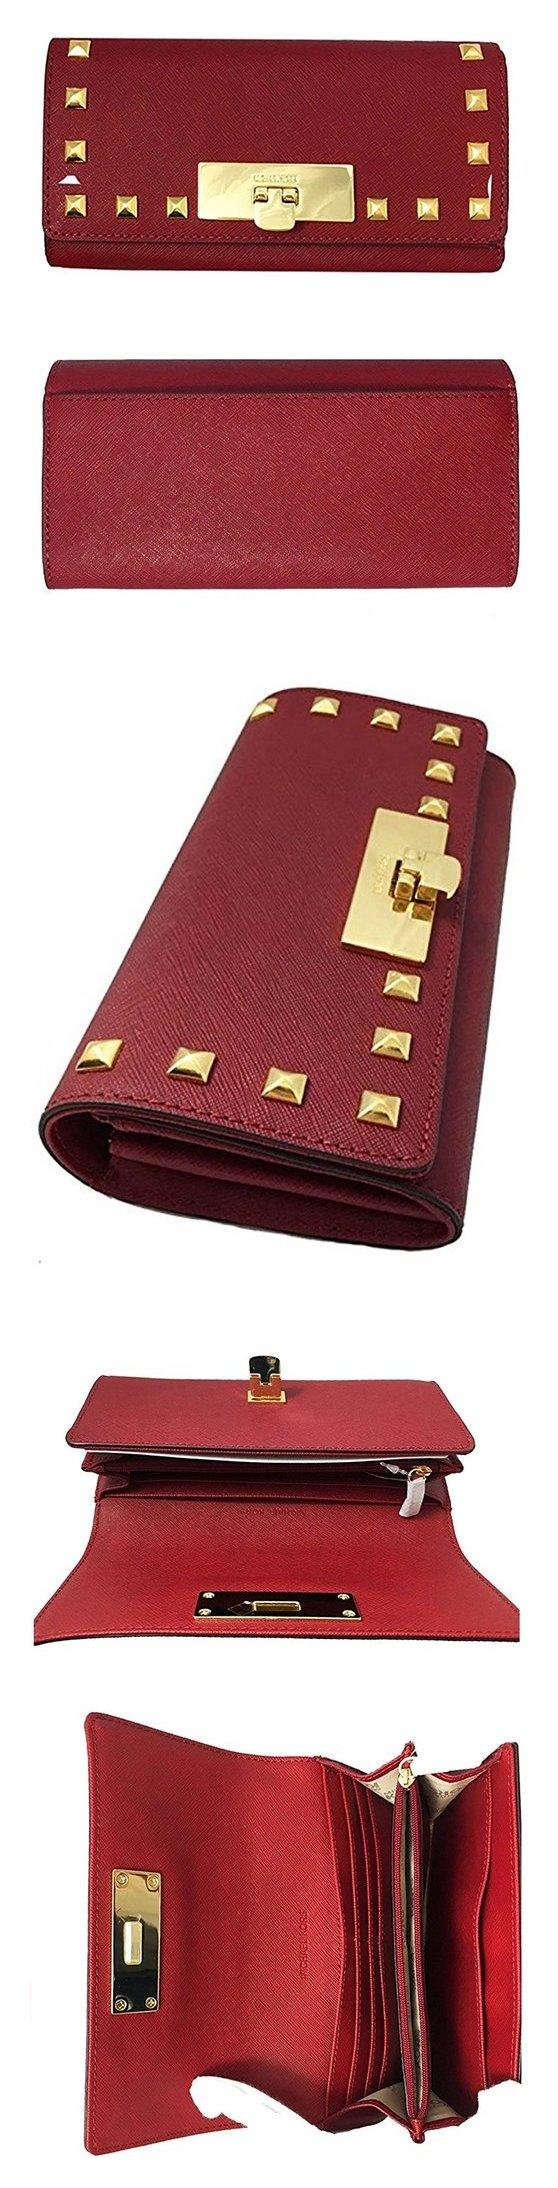 8fb6778287afdb $139.99 - Michael Kors Callie Stud Saffiano Leather Carryall Wallet Cherry # michaelkors